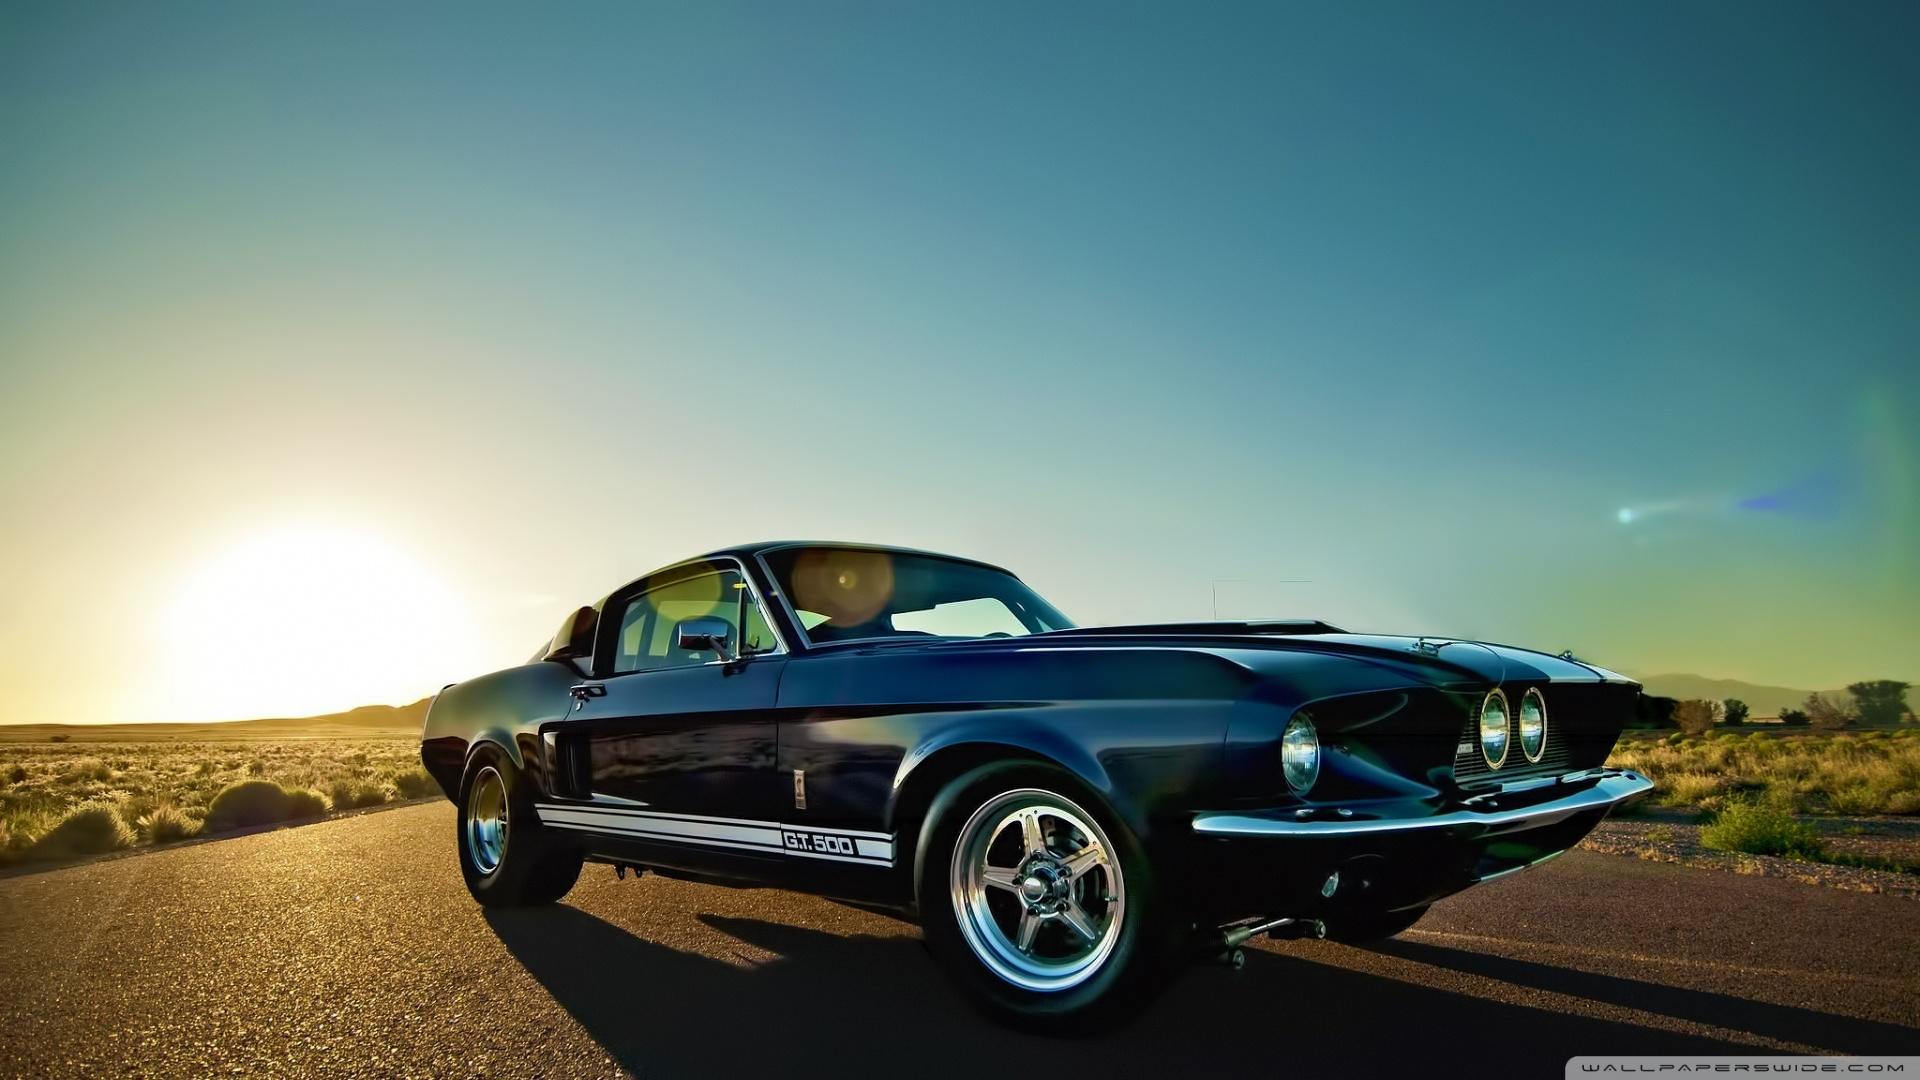 HD-Vintage-Car-Wallpaper (1)